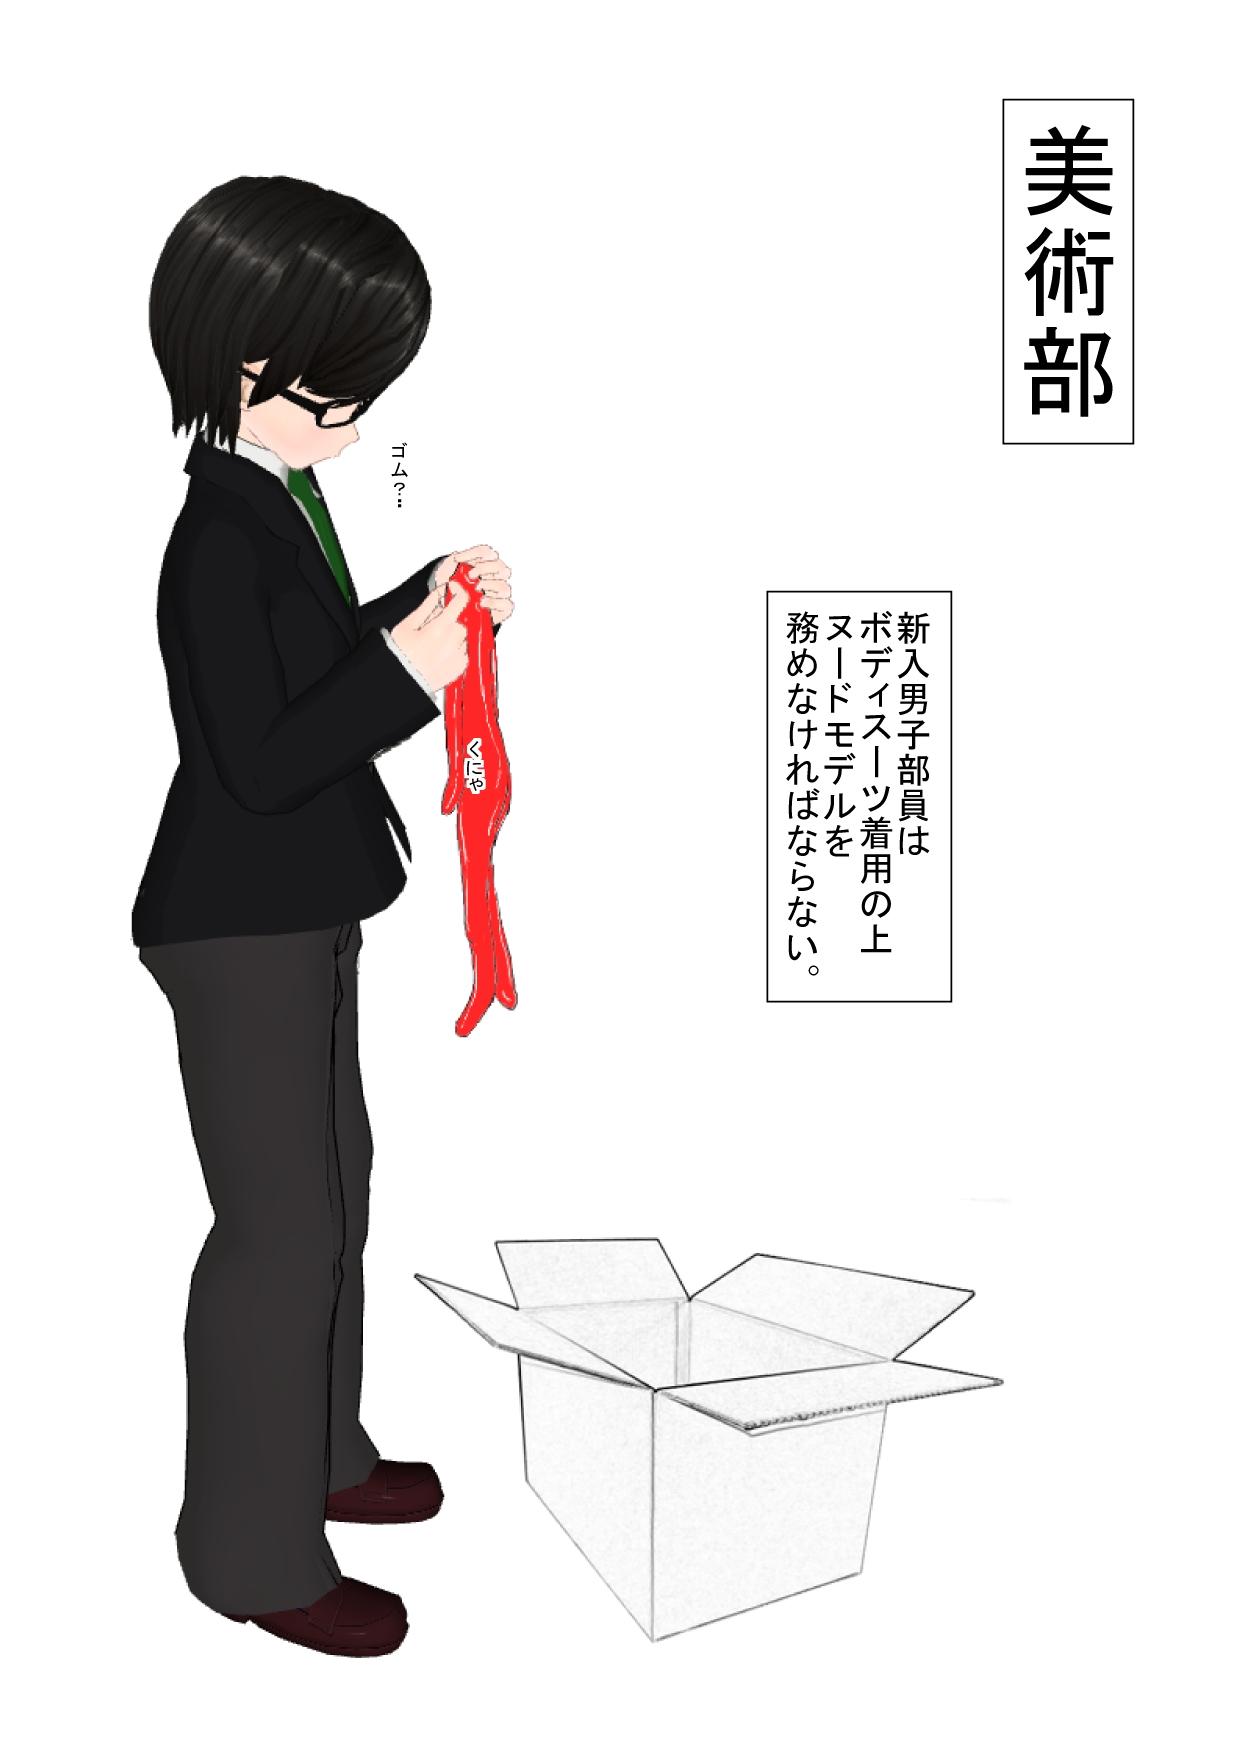 bijyutsubu0001.jpg